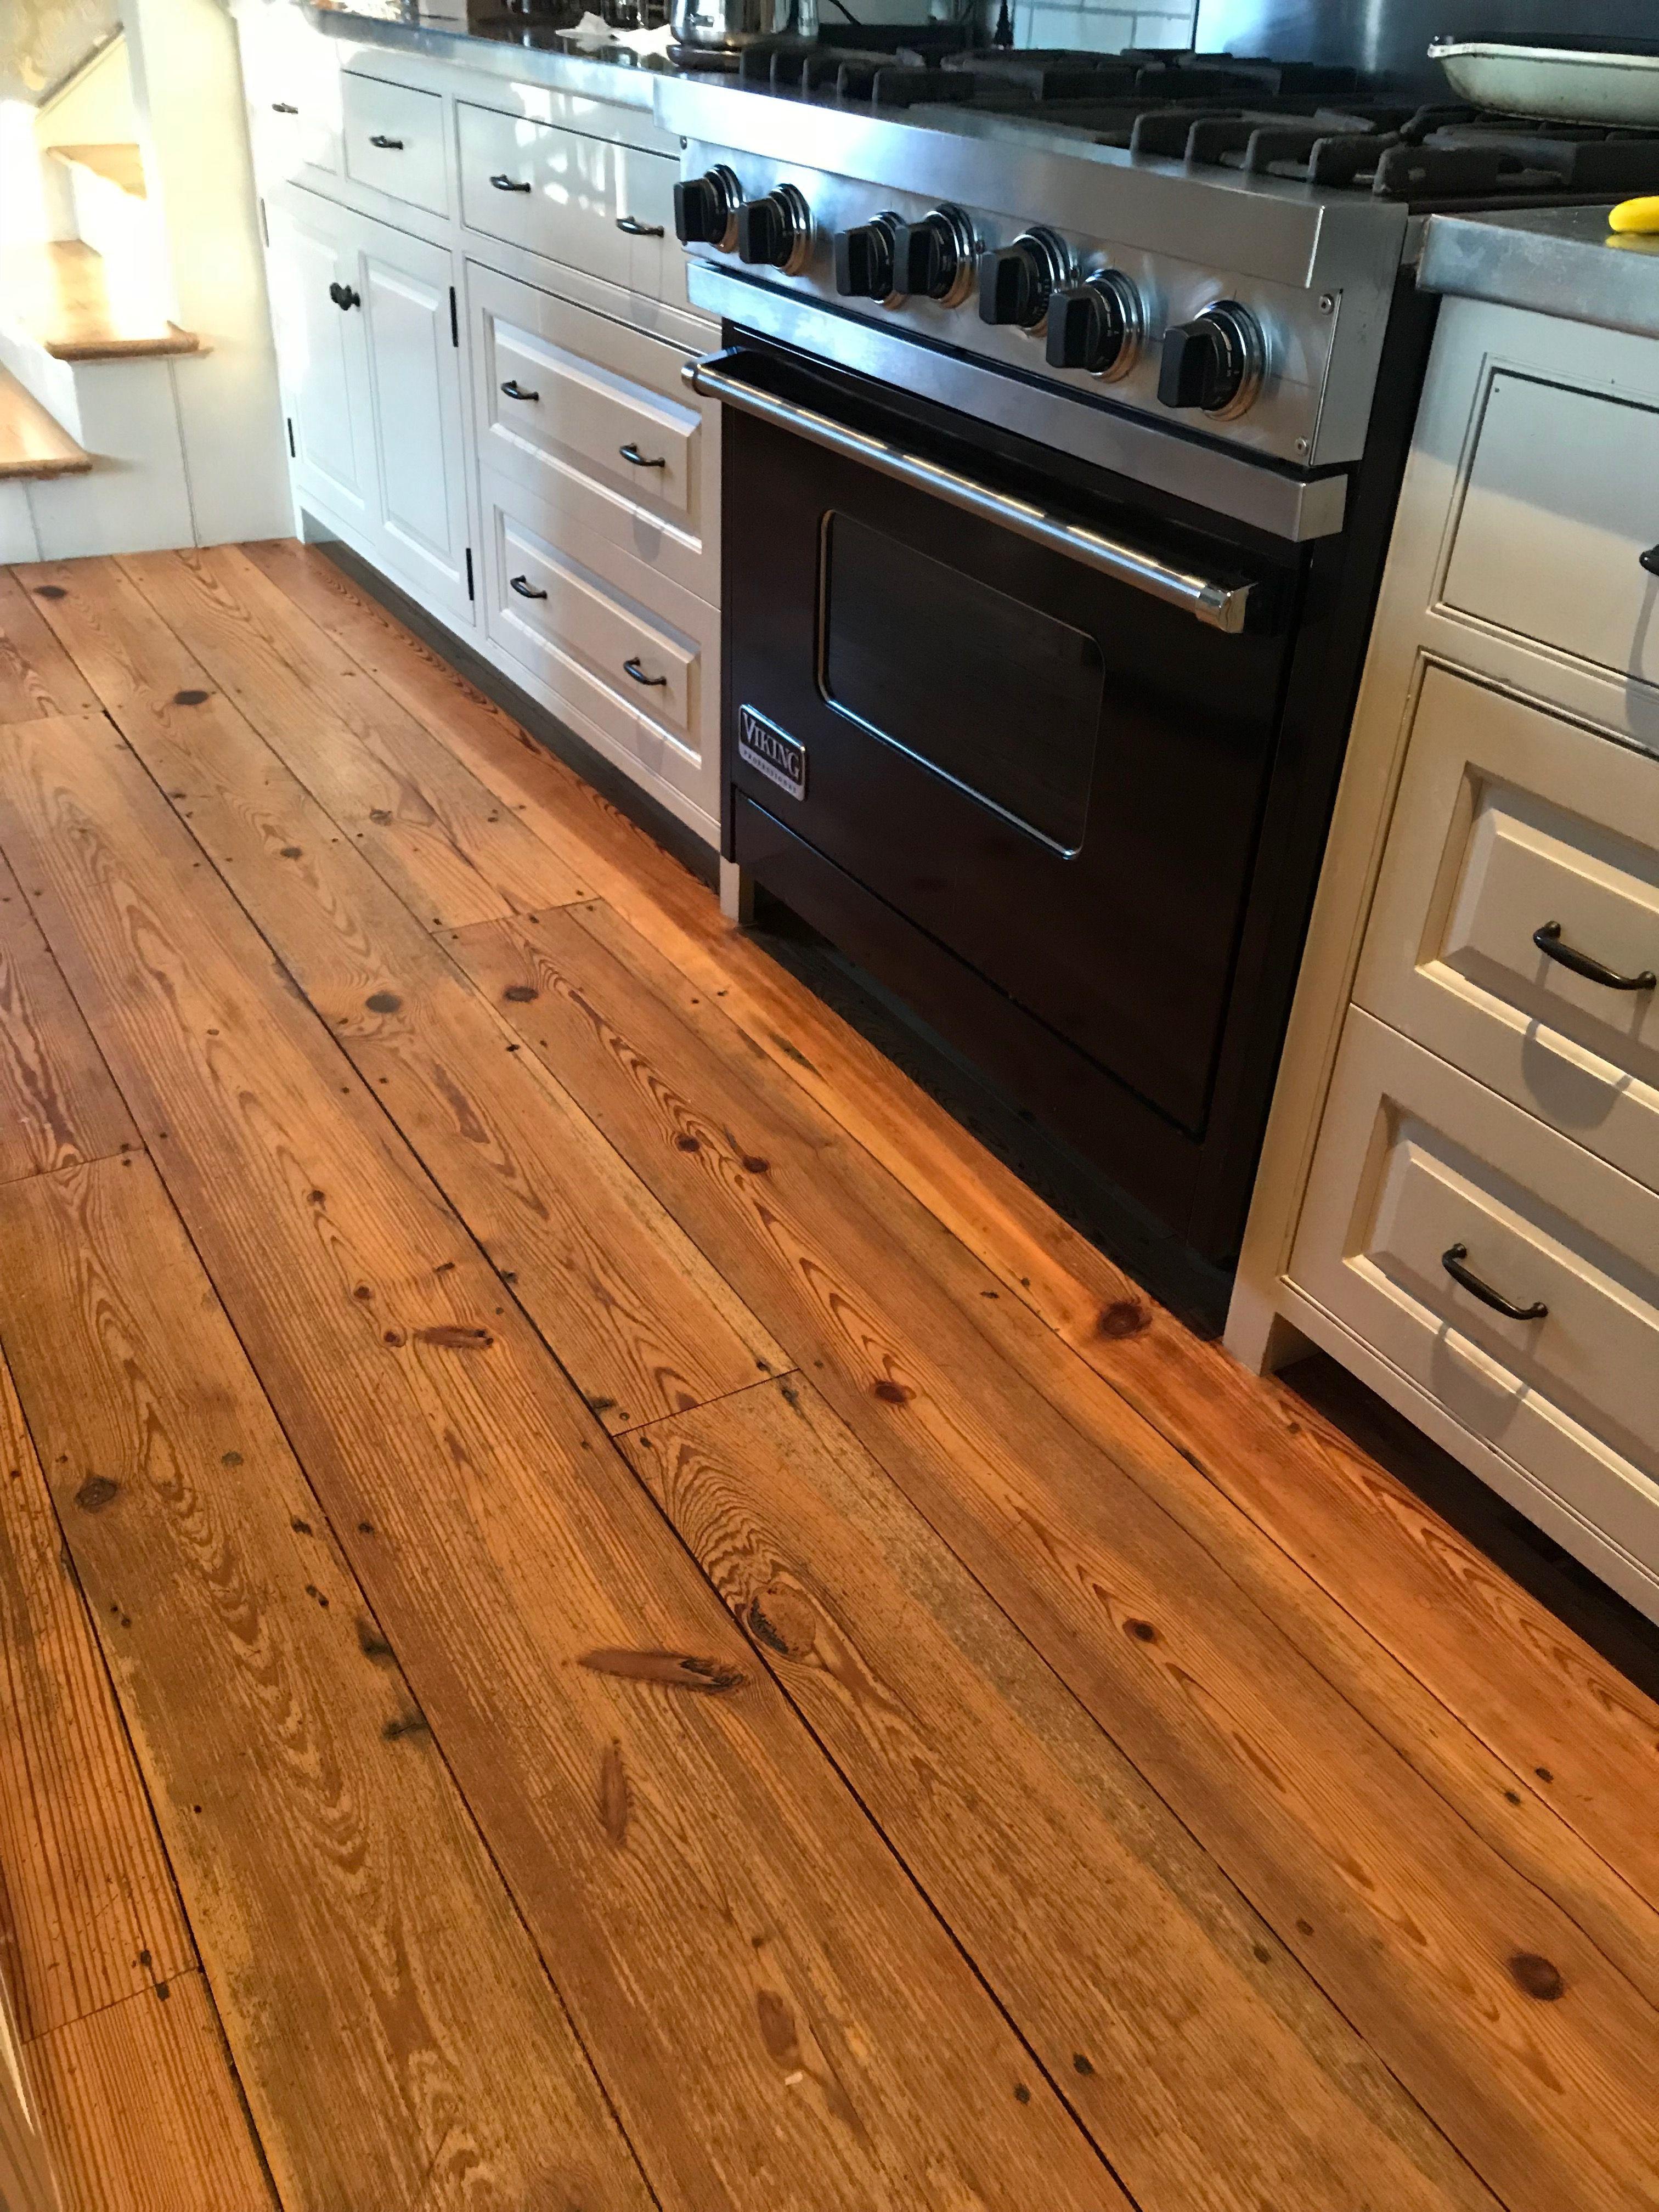 Black S Farmwood Reclaimed Wide Plank Heart Pine Flooring Reclaimed Wood Floors Heart Pine Flooring Hand Hewn Beams